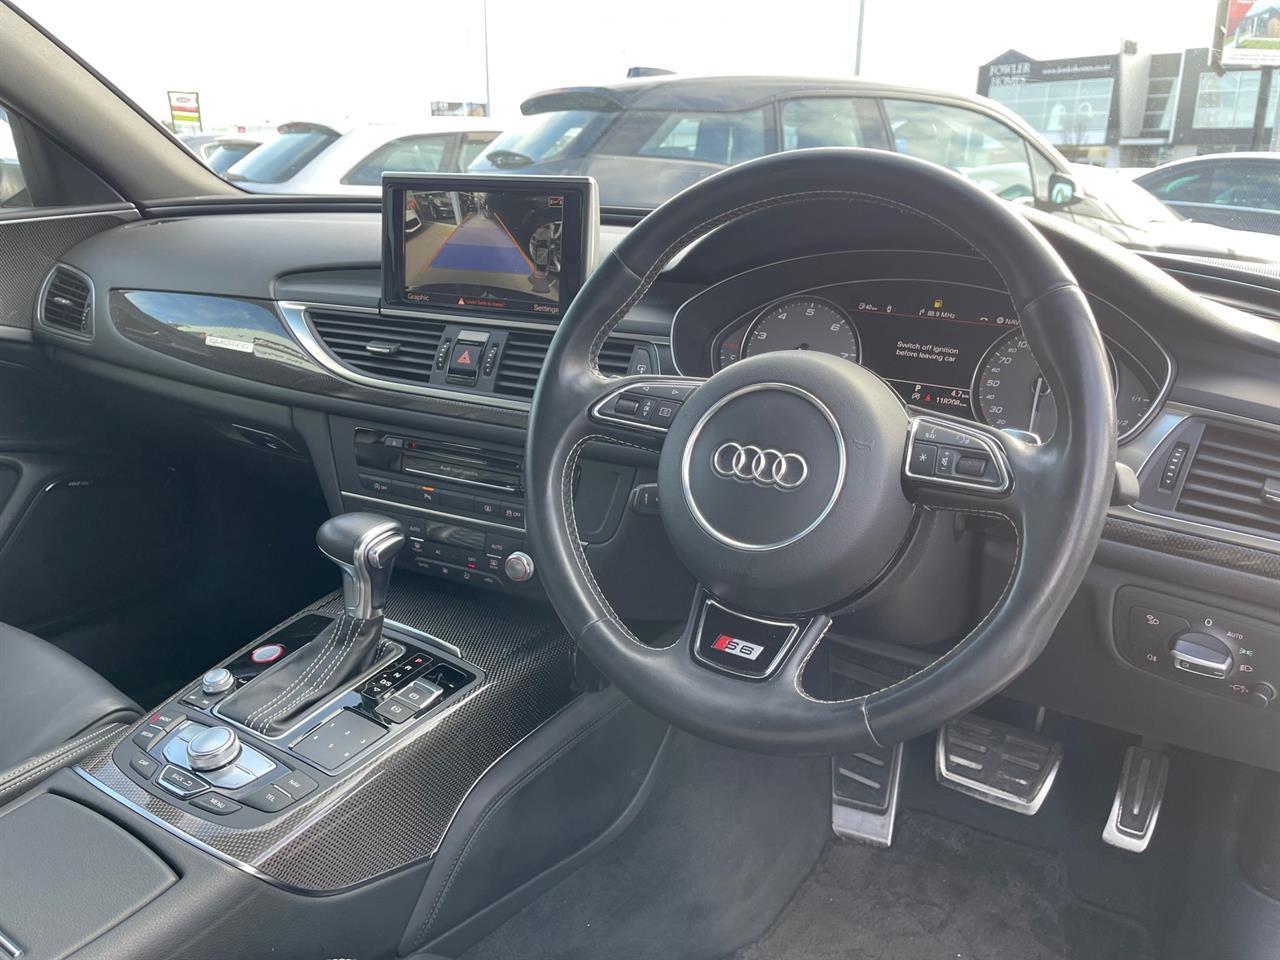 image-9, 2013 Audi S6 4.0 V8 TFSI Quattro Sedan at Christchurch